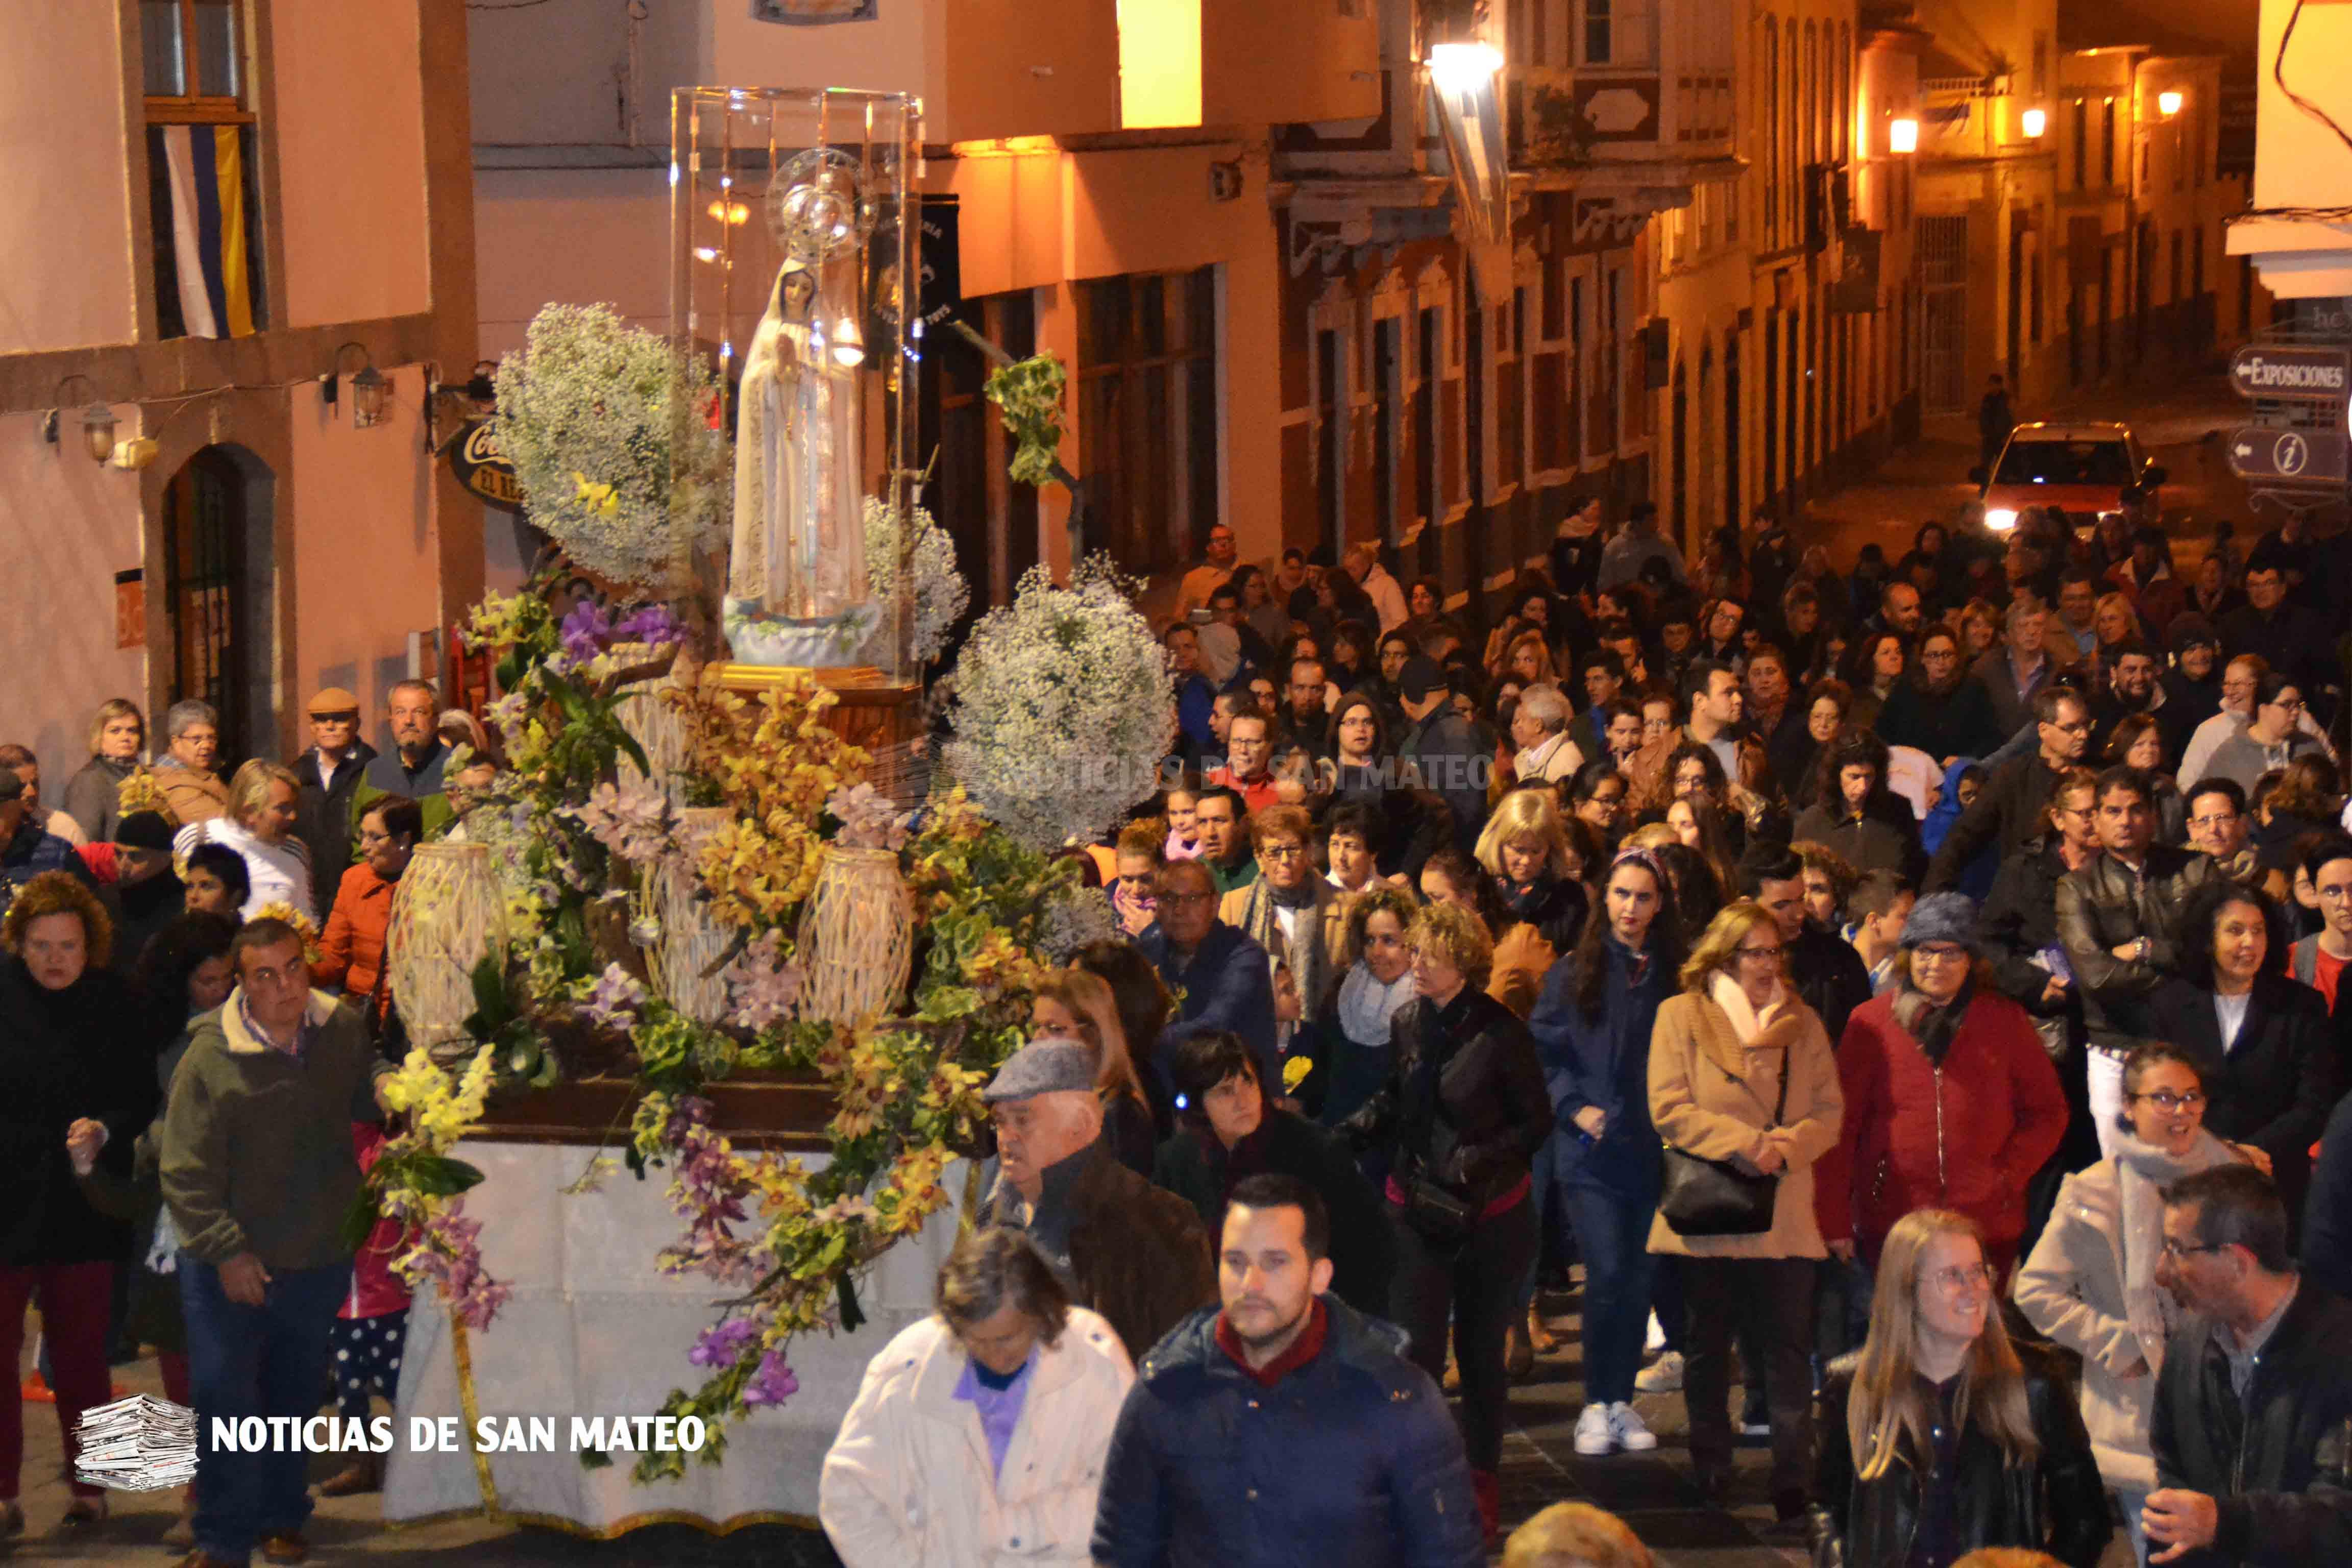 Portada Procesion Virgen Fatima Chorrillo San Mateo Foto Laura Miranda Noticias de San Mateo